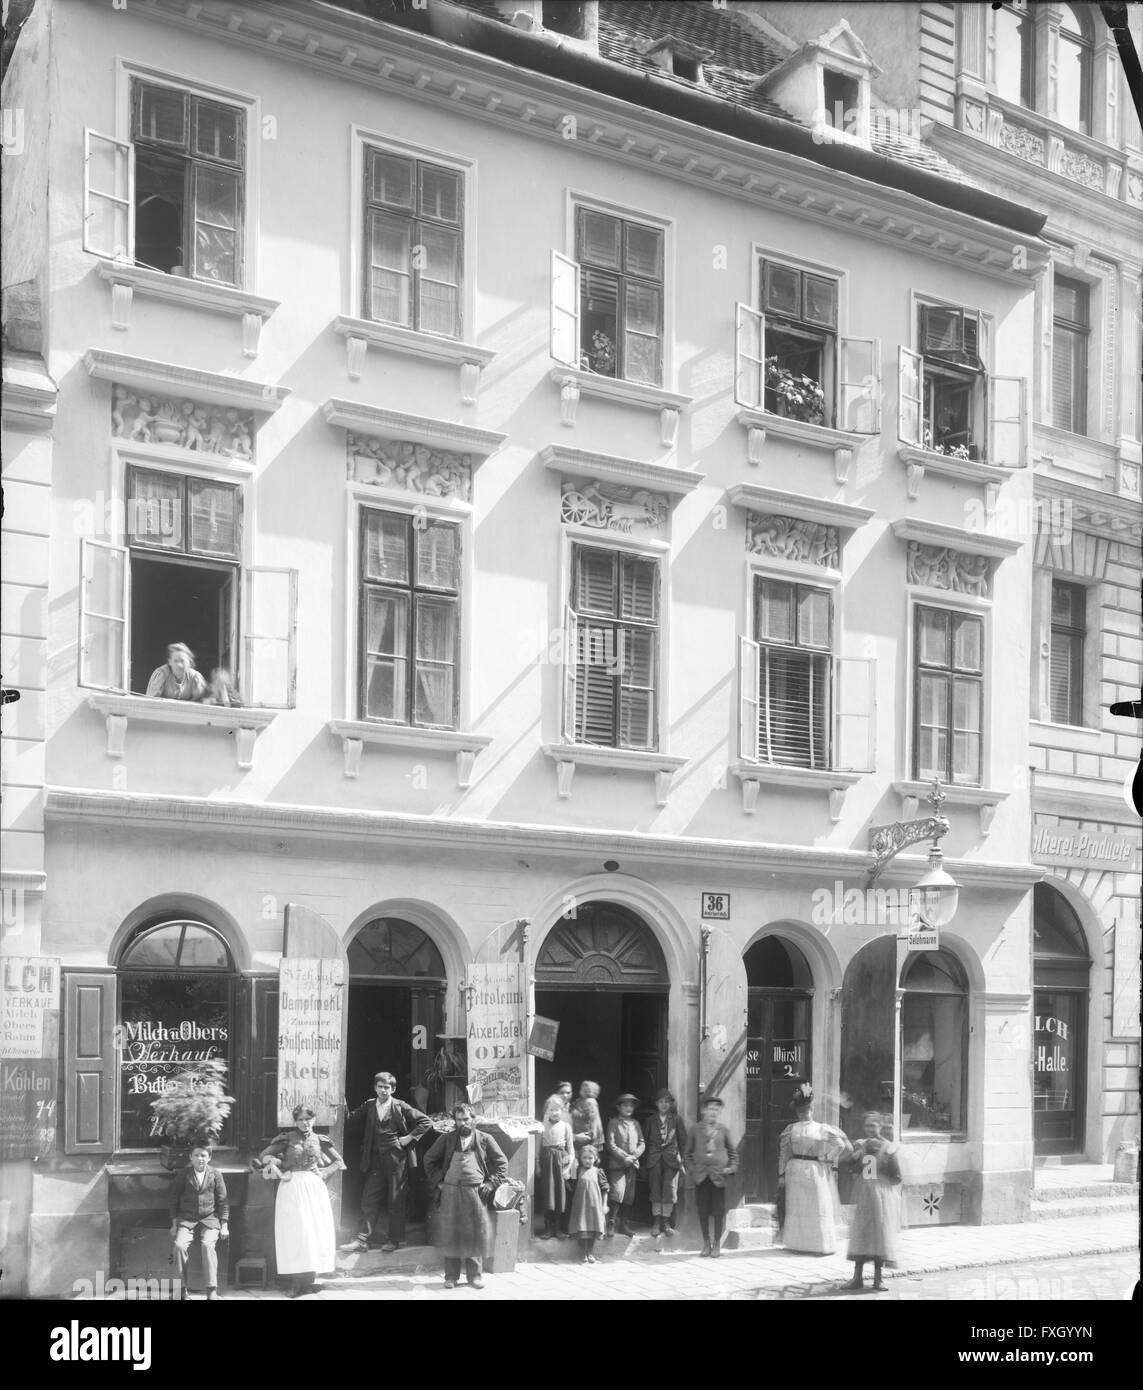 Wien 2, Große Sperlgasse 36 - Stock Image